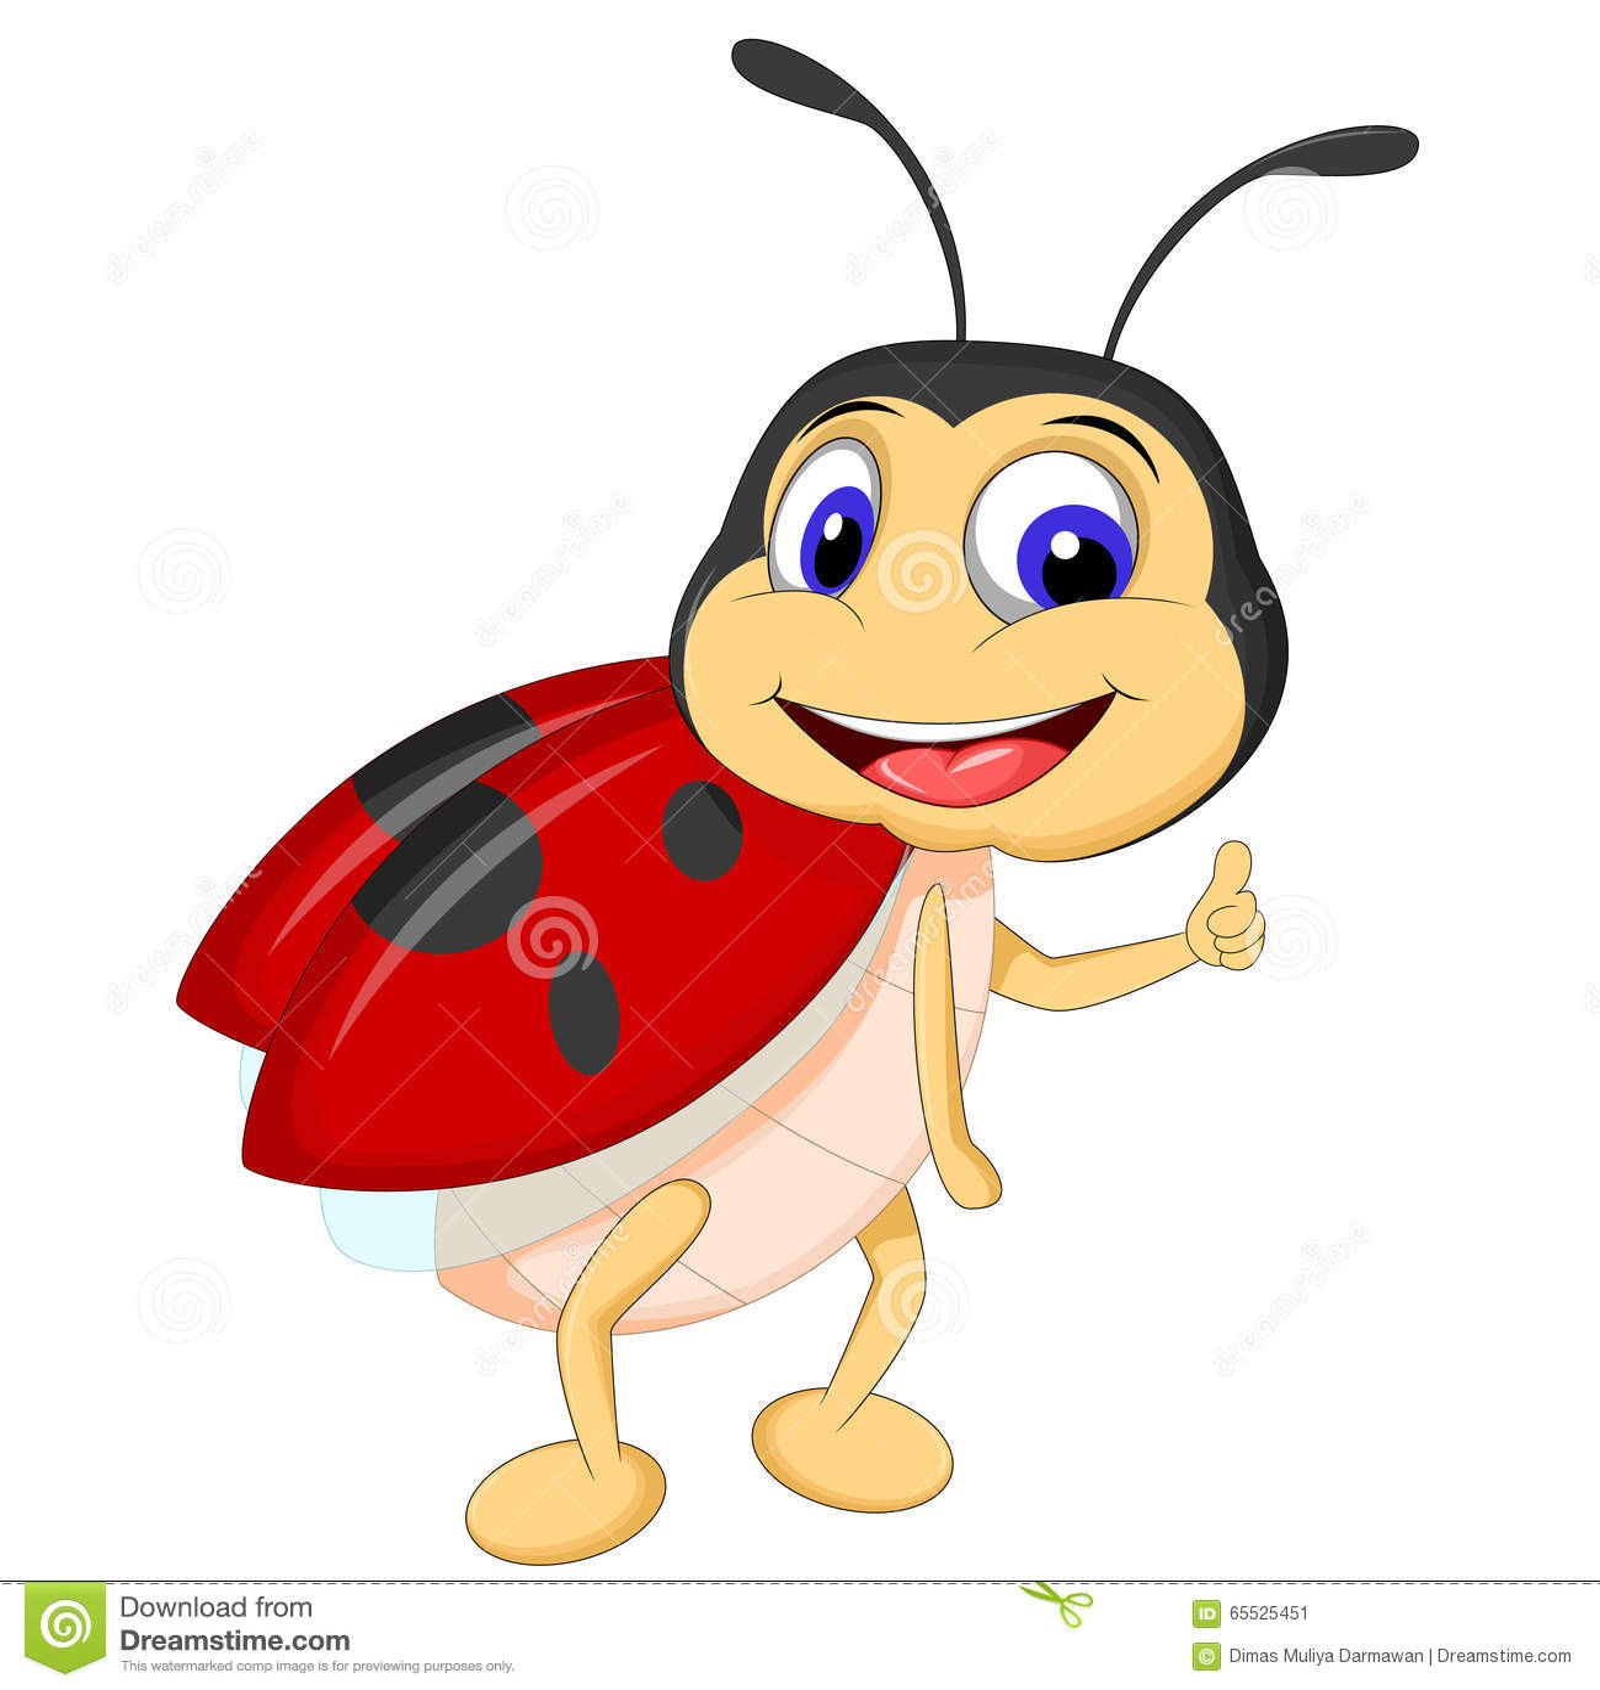 ladybugs stock illustrations u2013 2 141 ladybugs stock illustrations